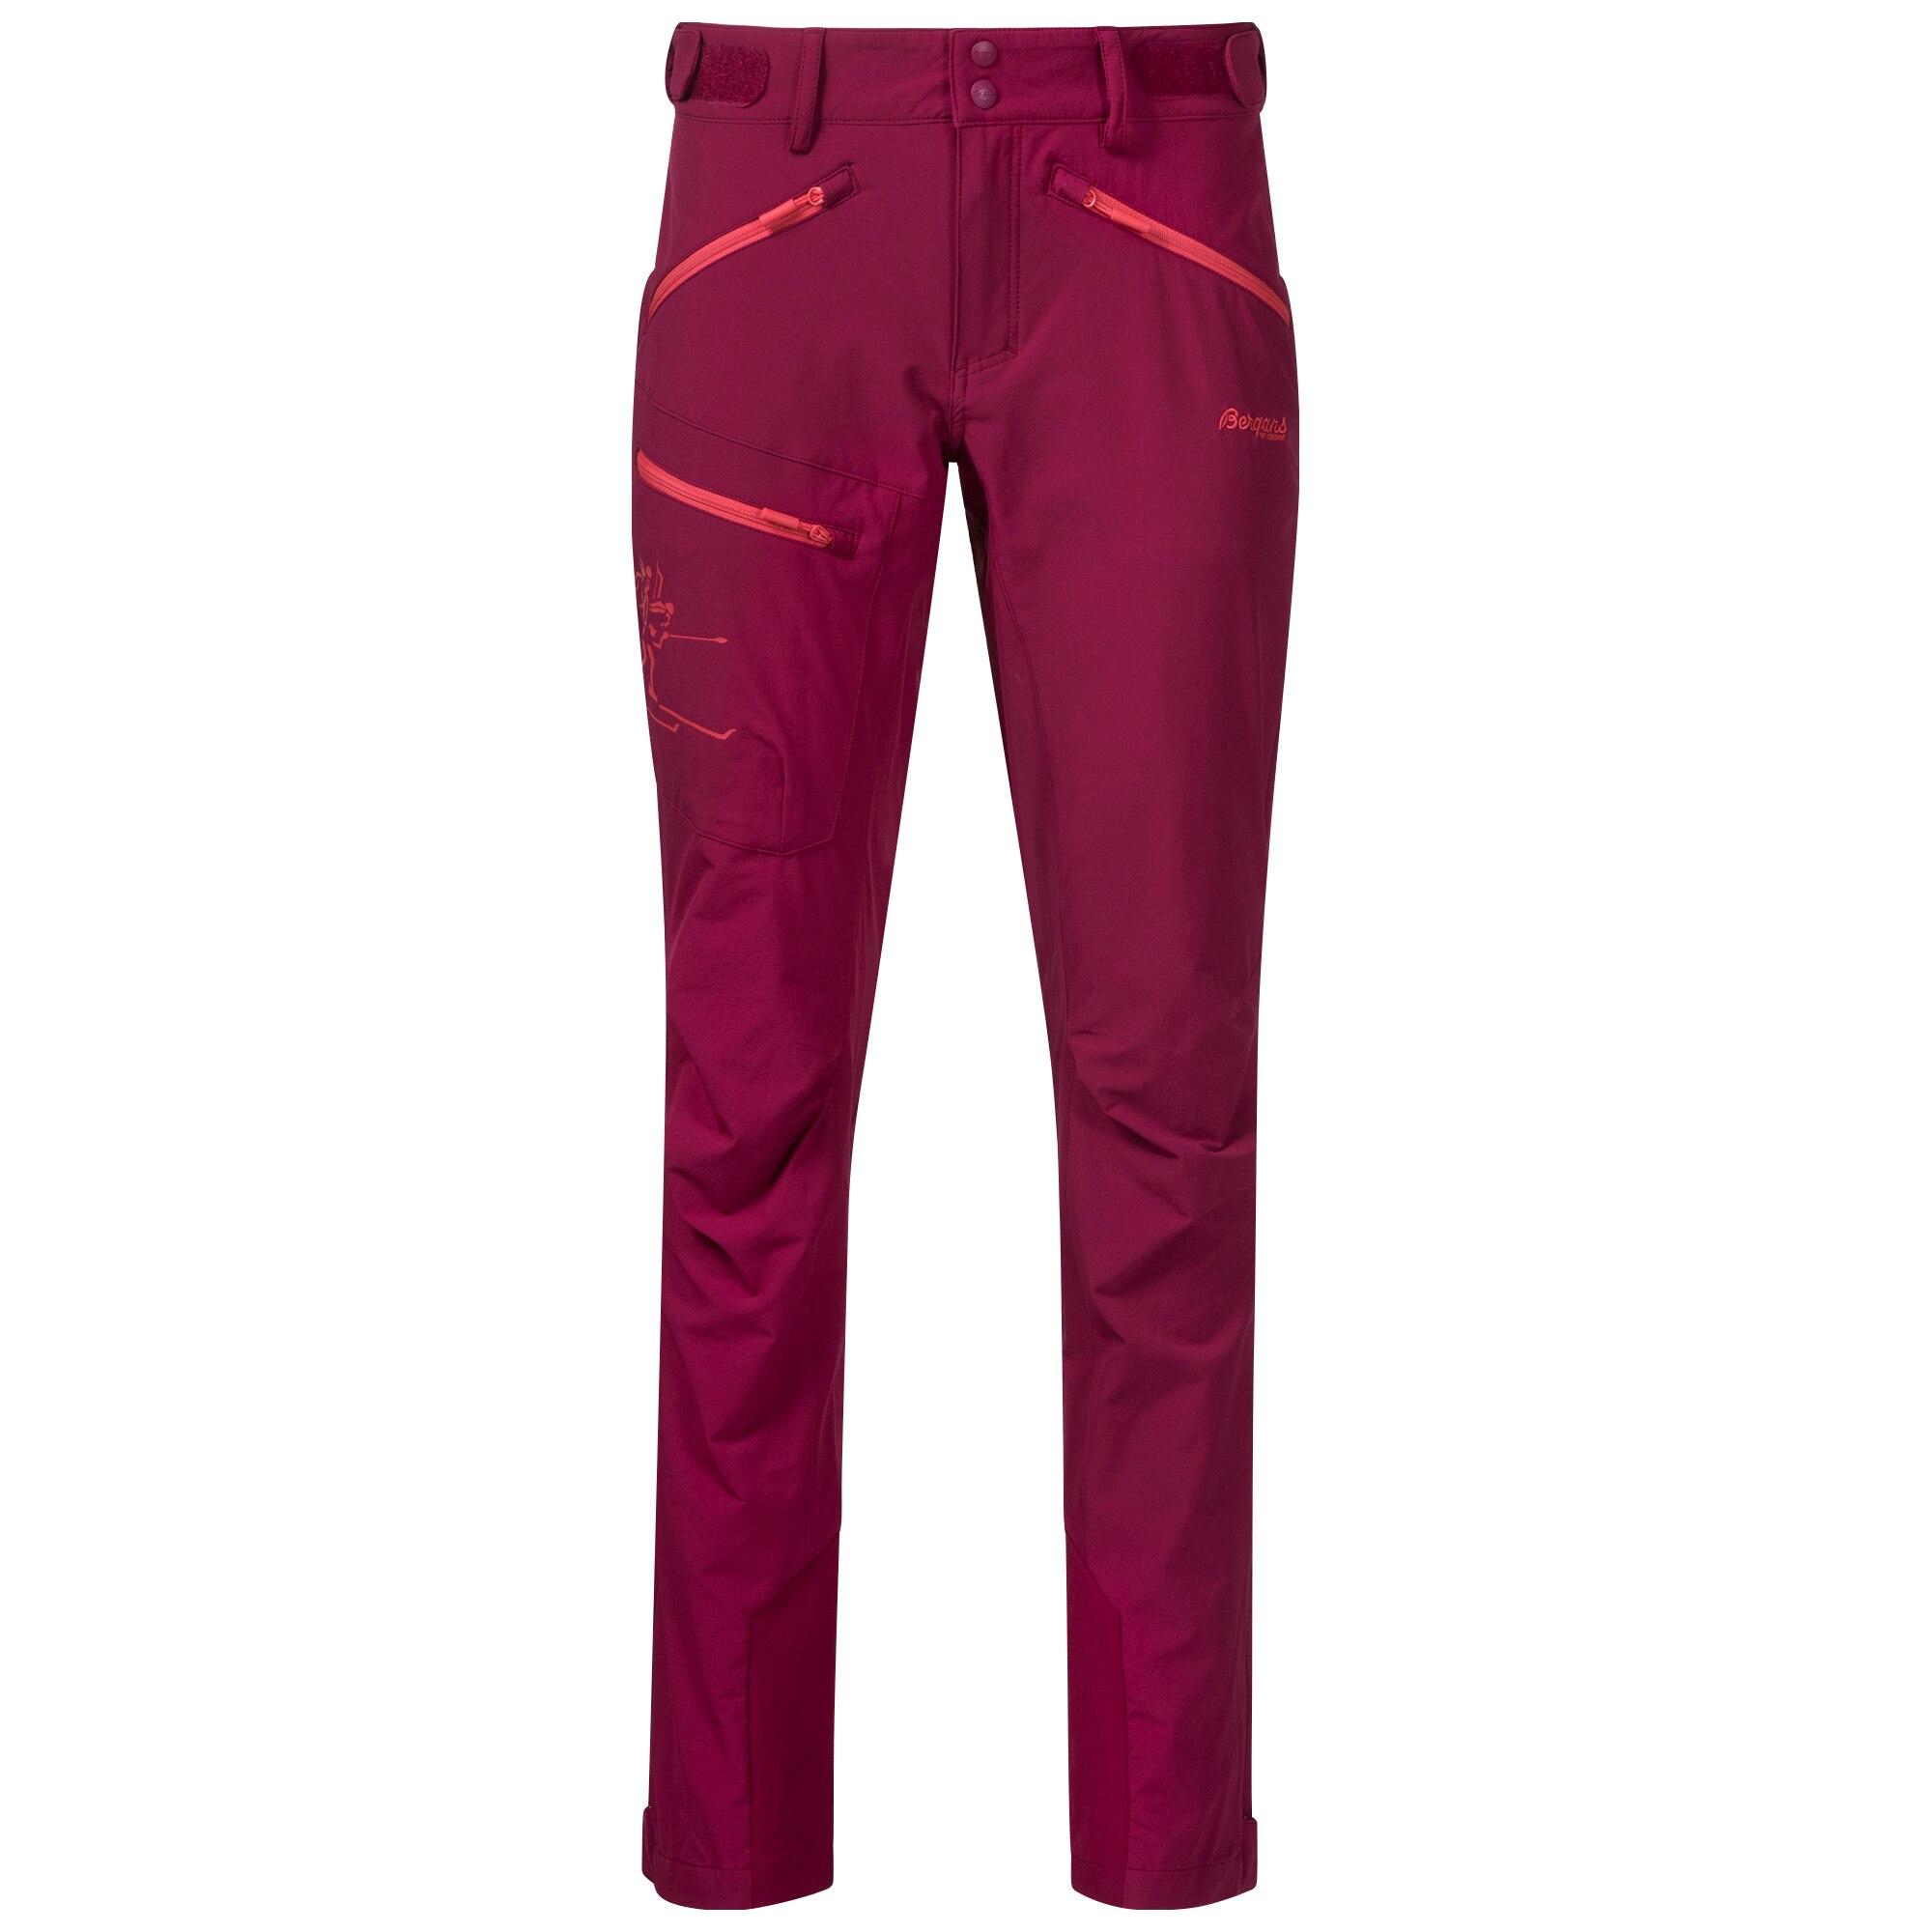 Romsdal Softshell W Pants